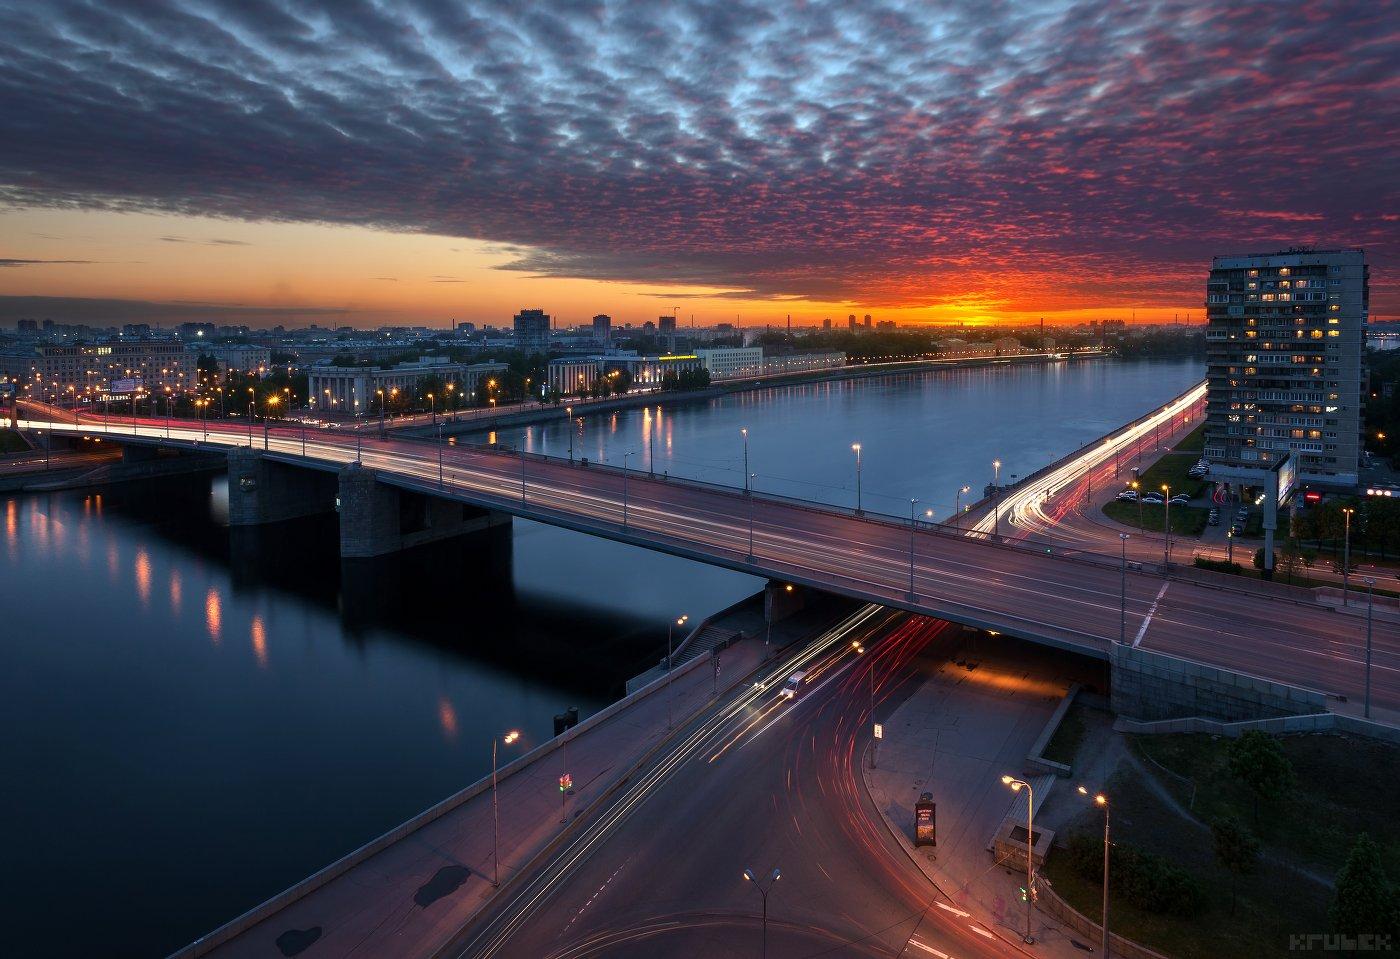 володарский, закат, мост, нева, облака, санкт-петербург, KrubeK